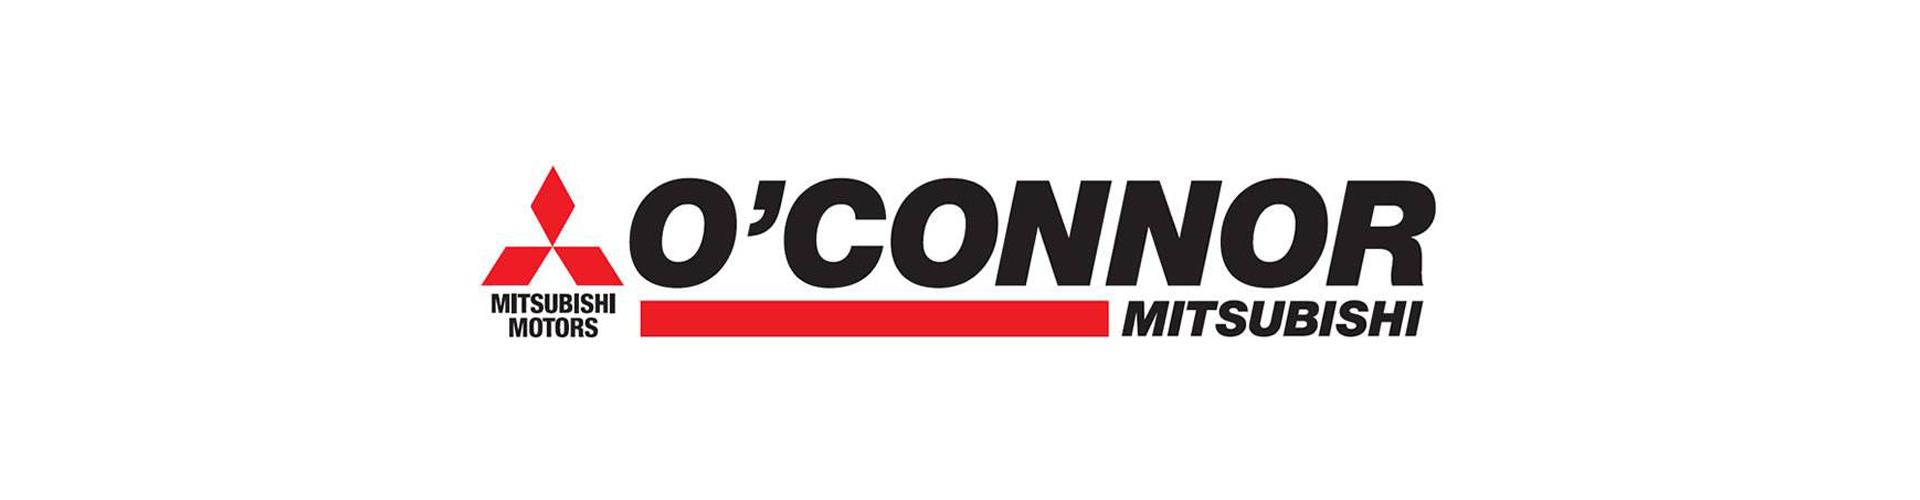 OConnorMits-ipb-may21-mdb